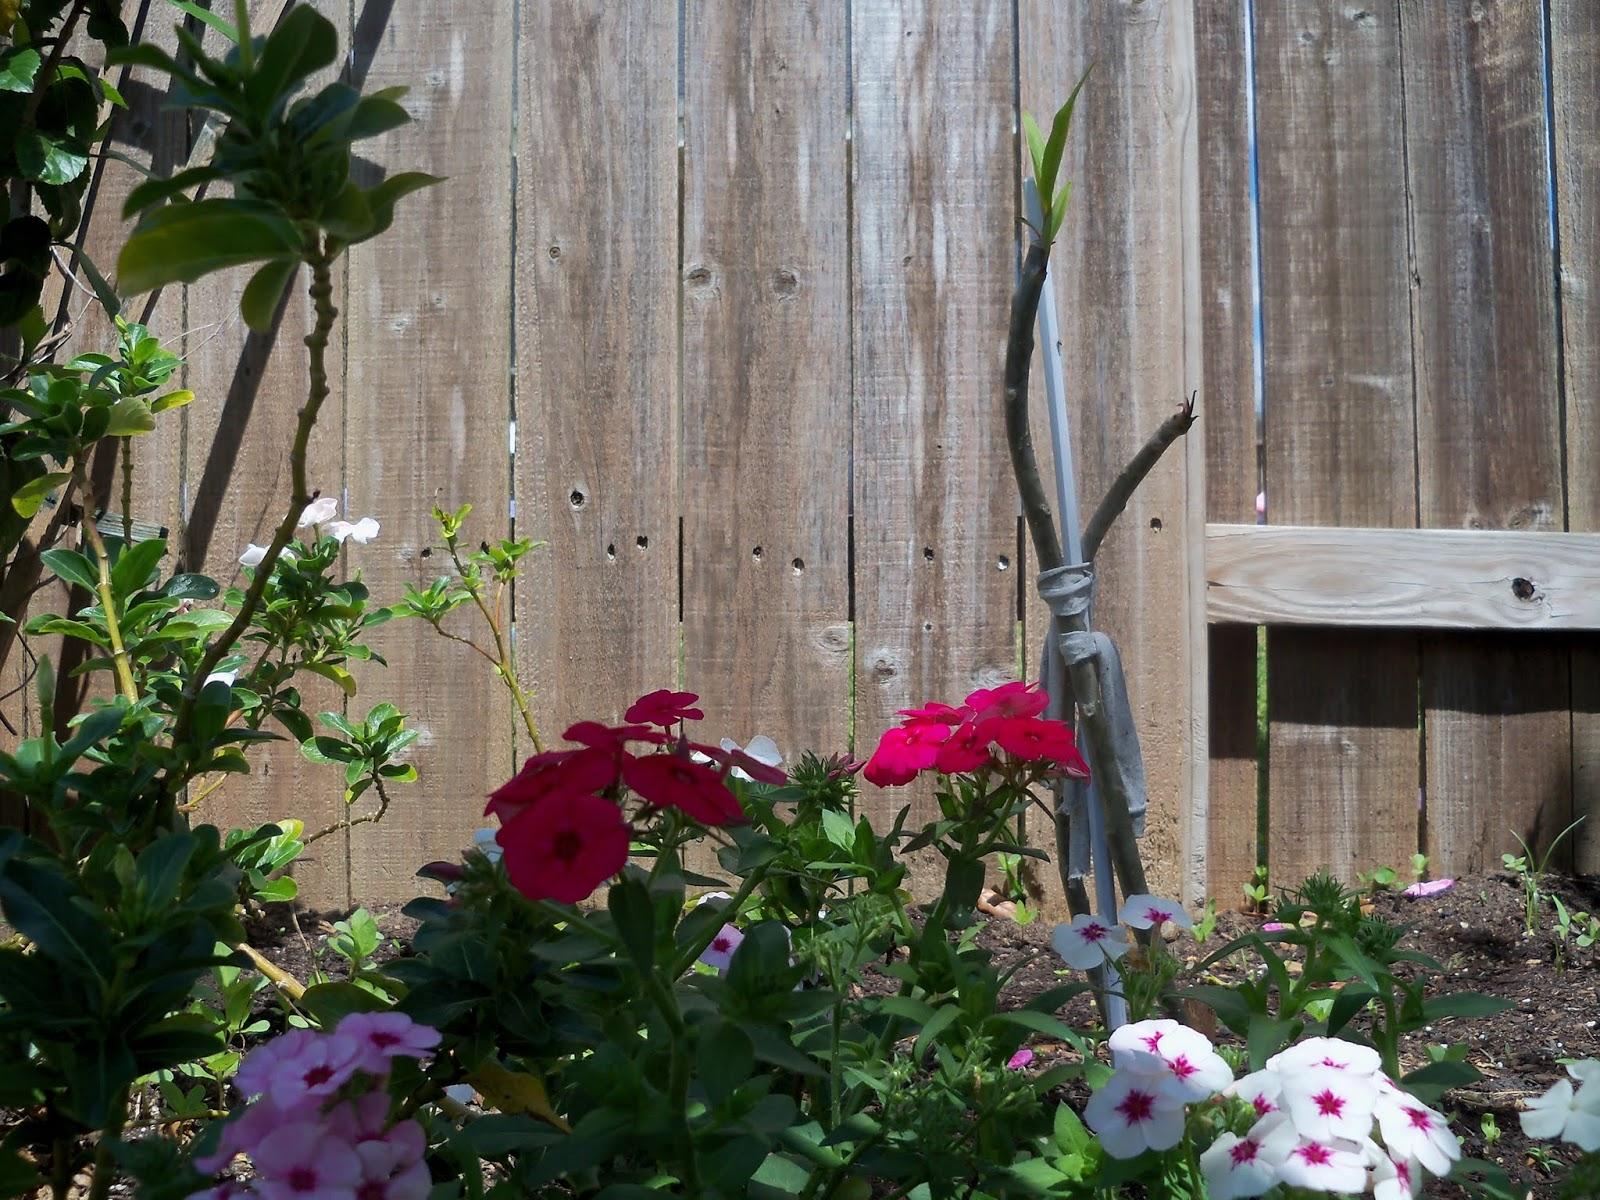 Gardening 2013 - 115_5685.JPG